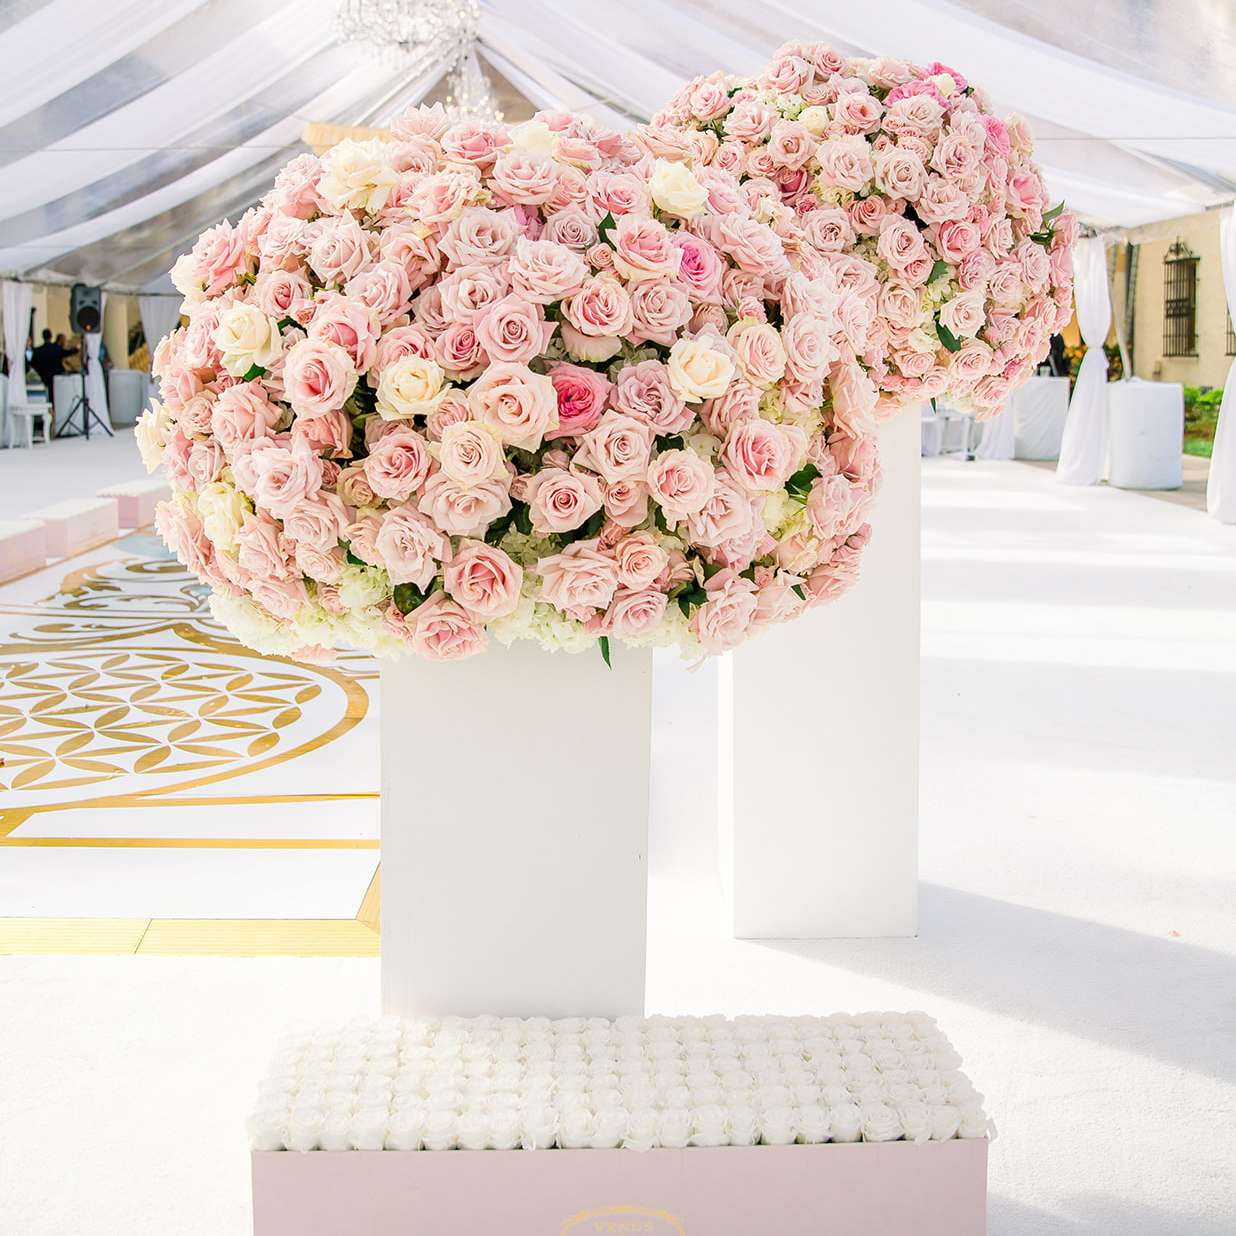 Rose floral arrangements